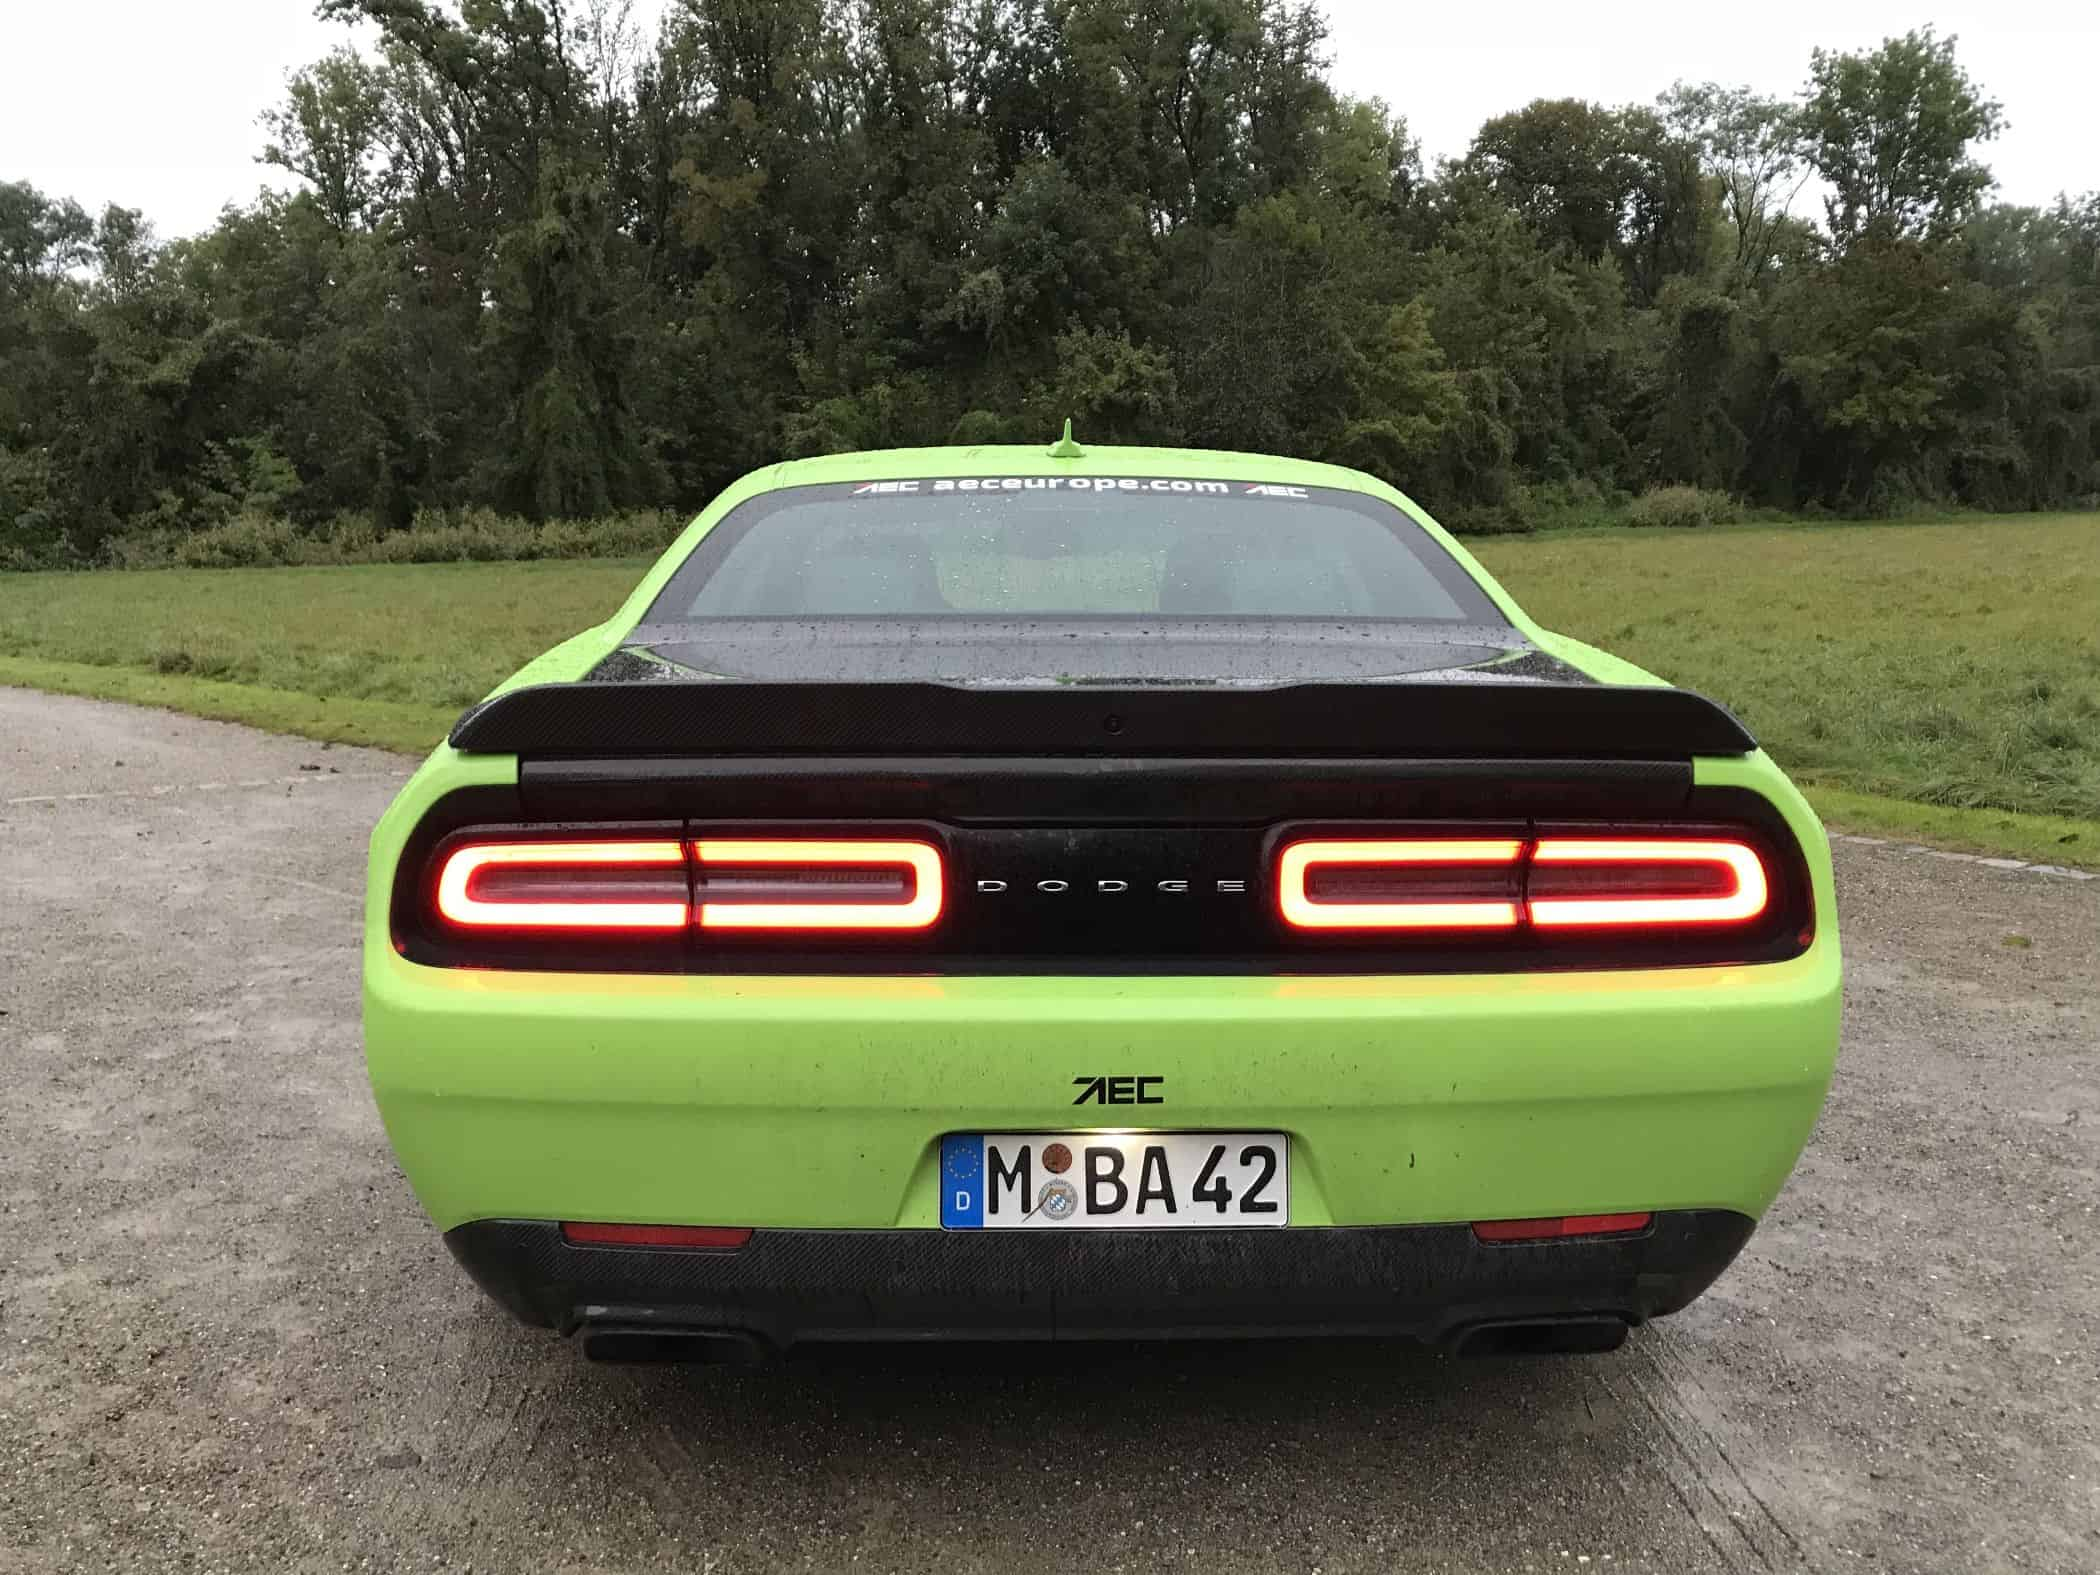 2020 AEC Dodge Challenger SRT Hellcat XR (888 PS)